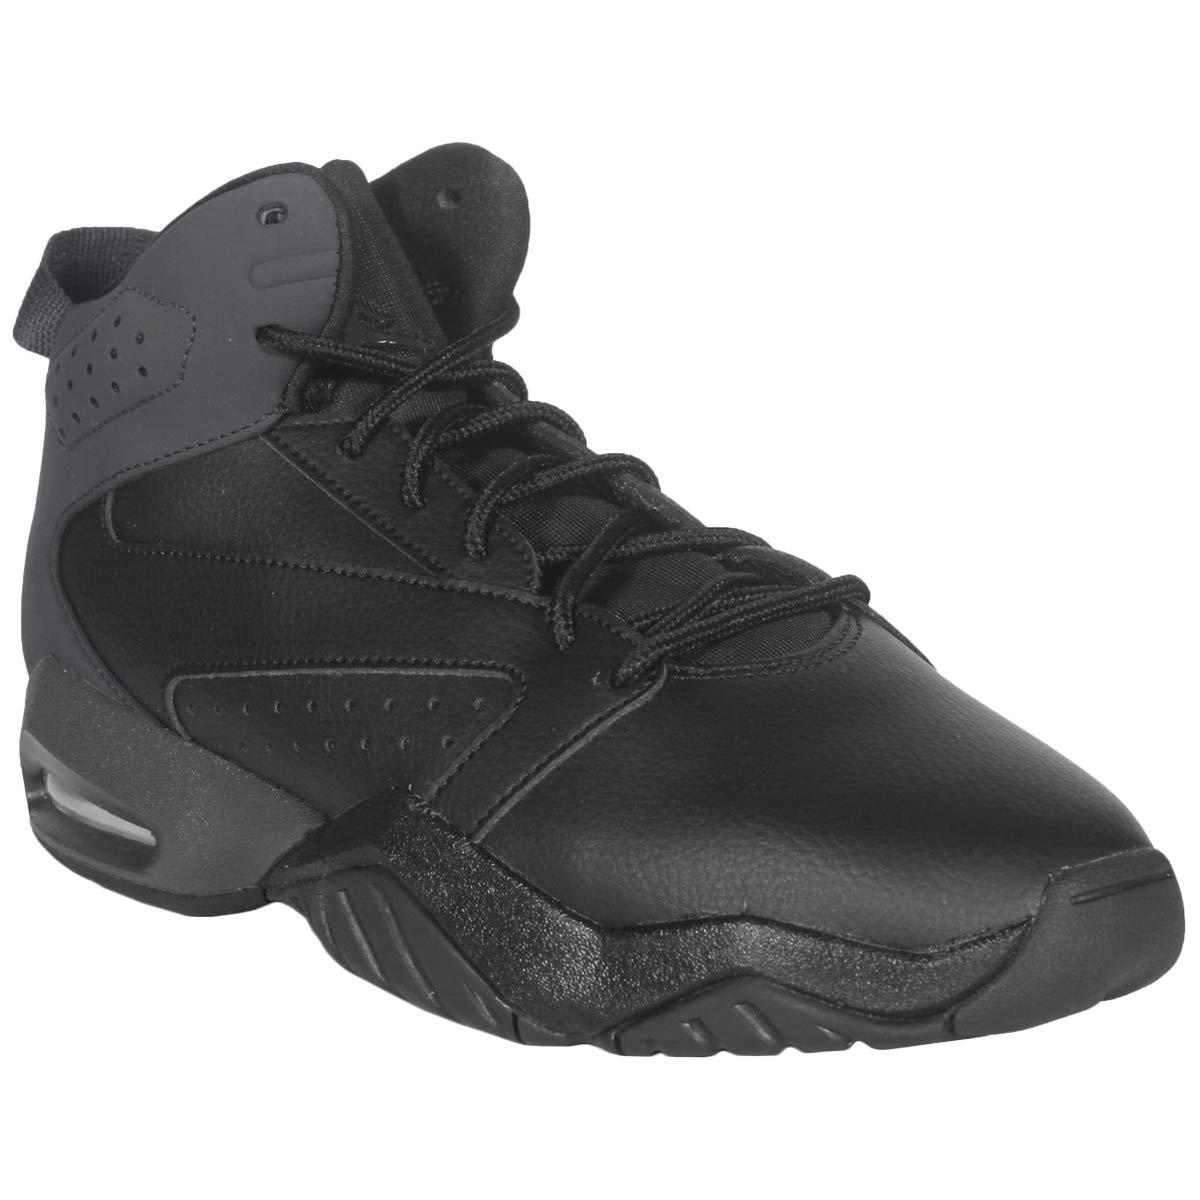 Jordan Mens Lift Off Black Anthracite Black Size 8